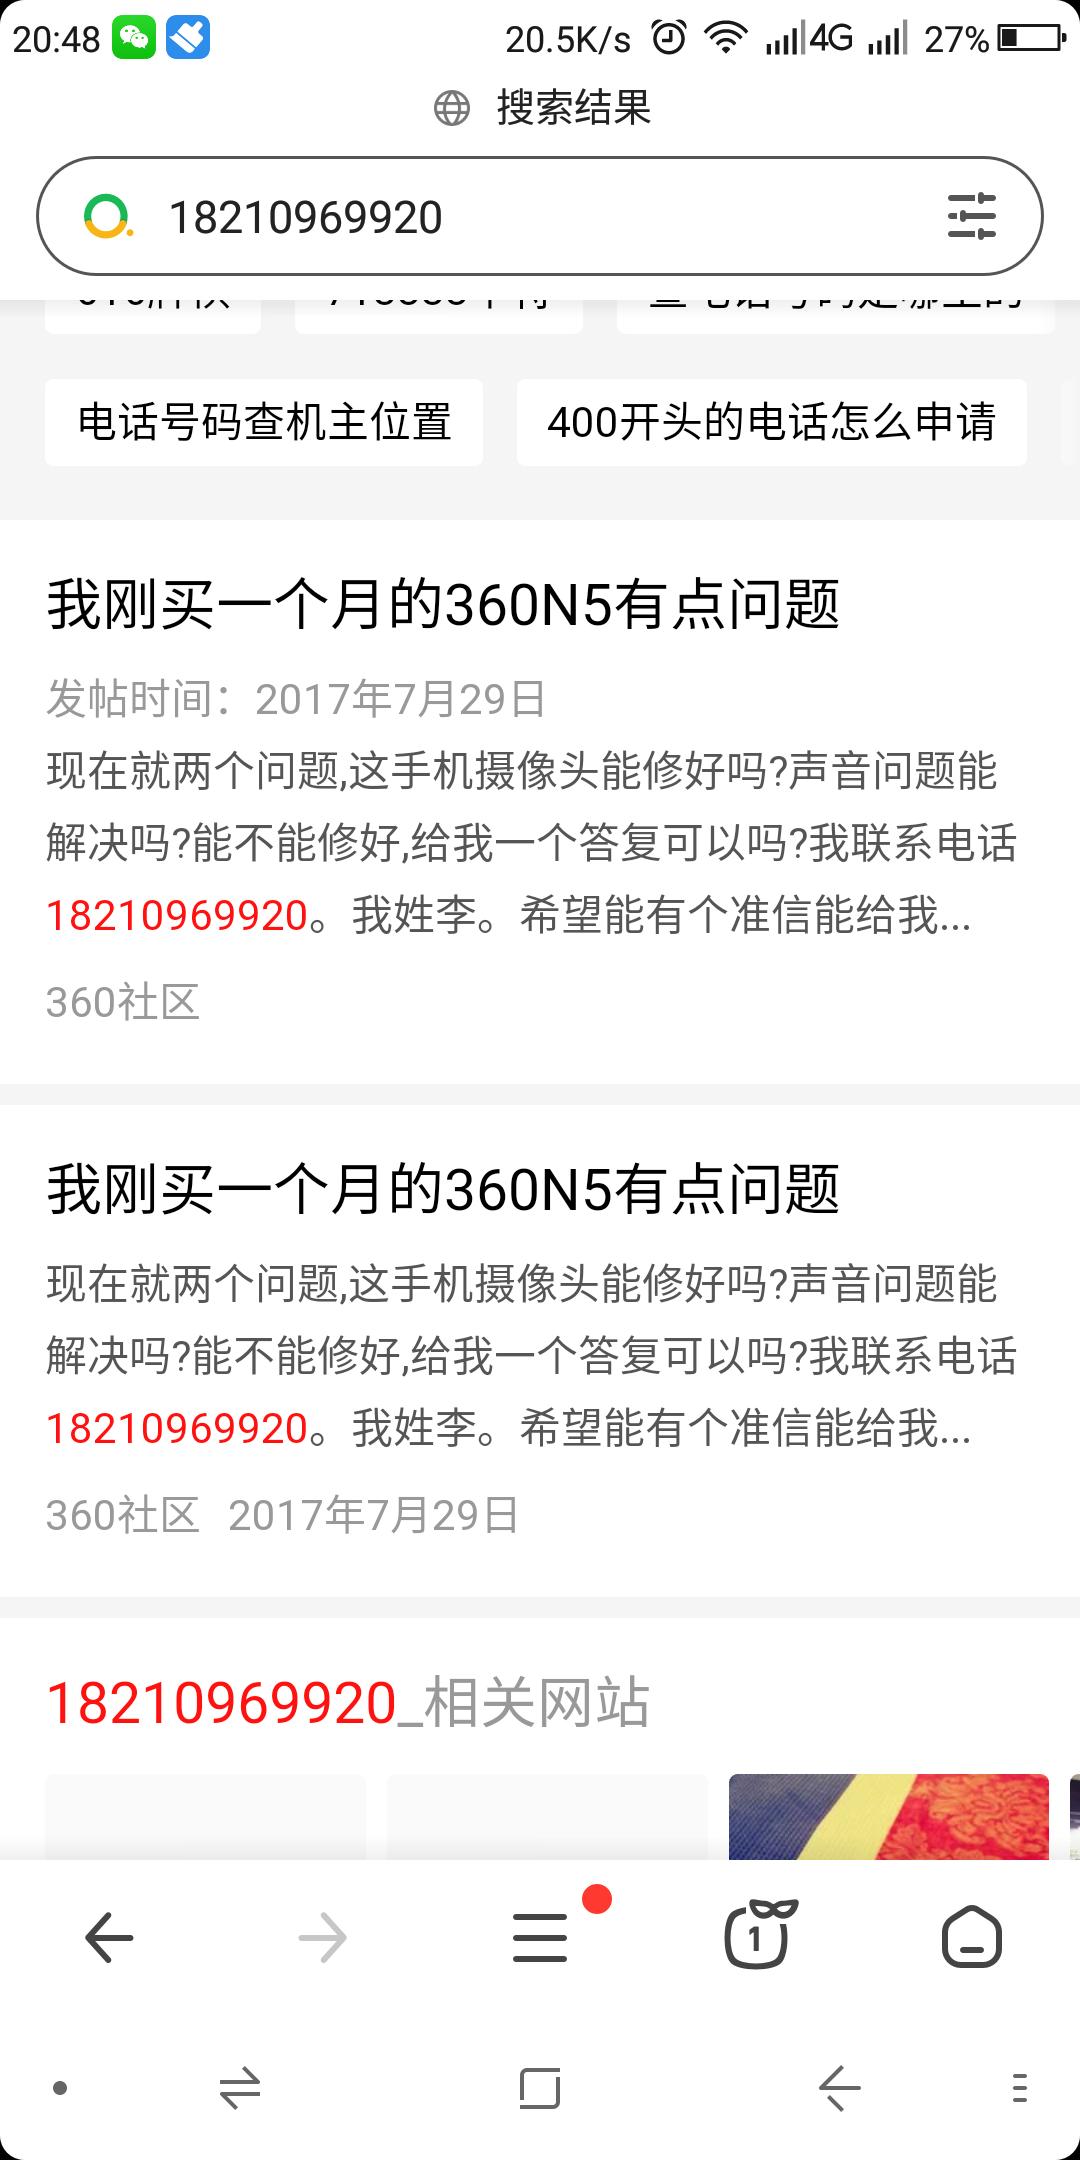 Screenshot_2021-03-04-20-48-50.png